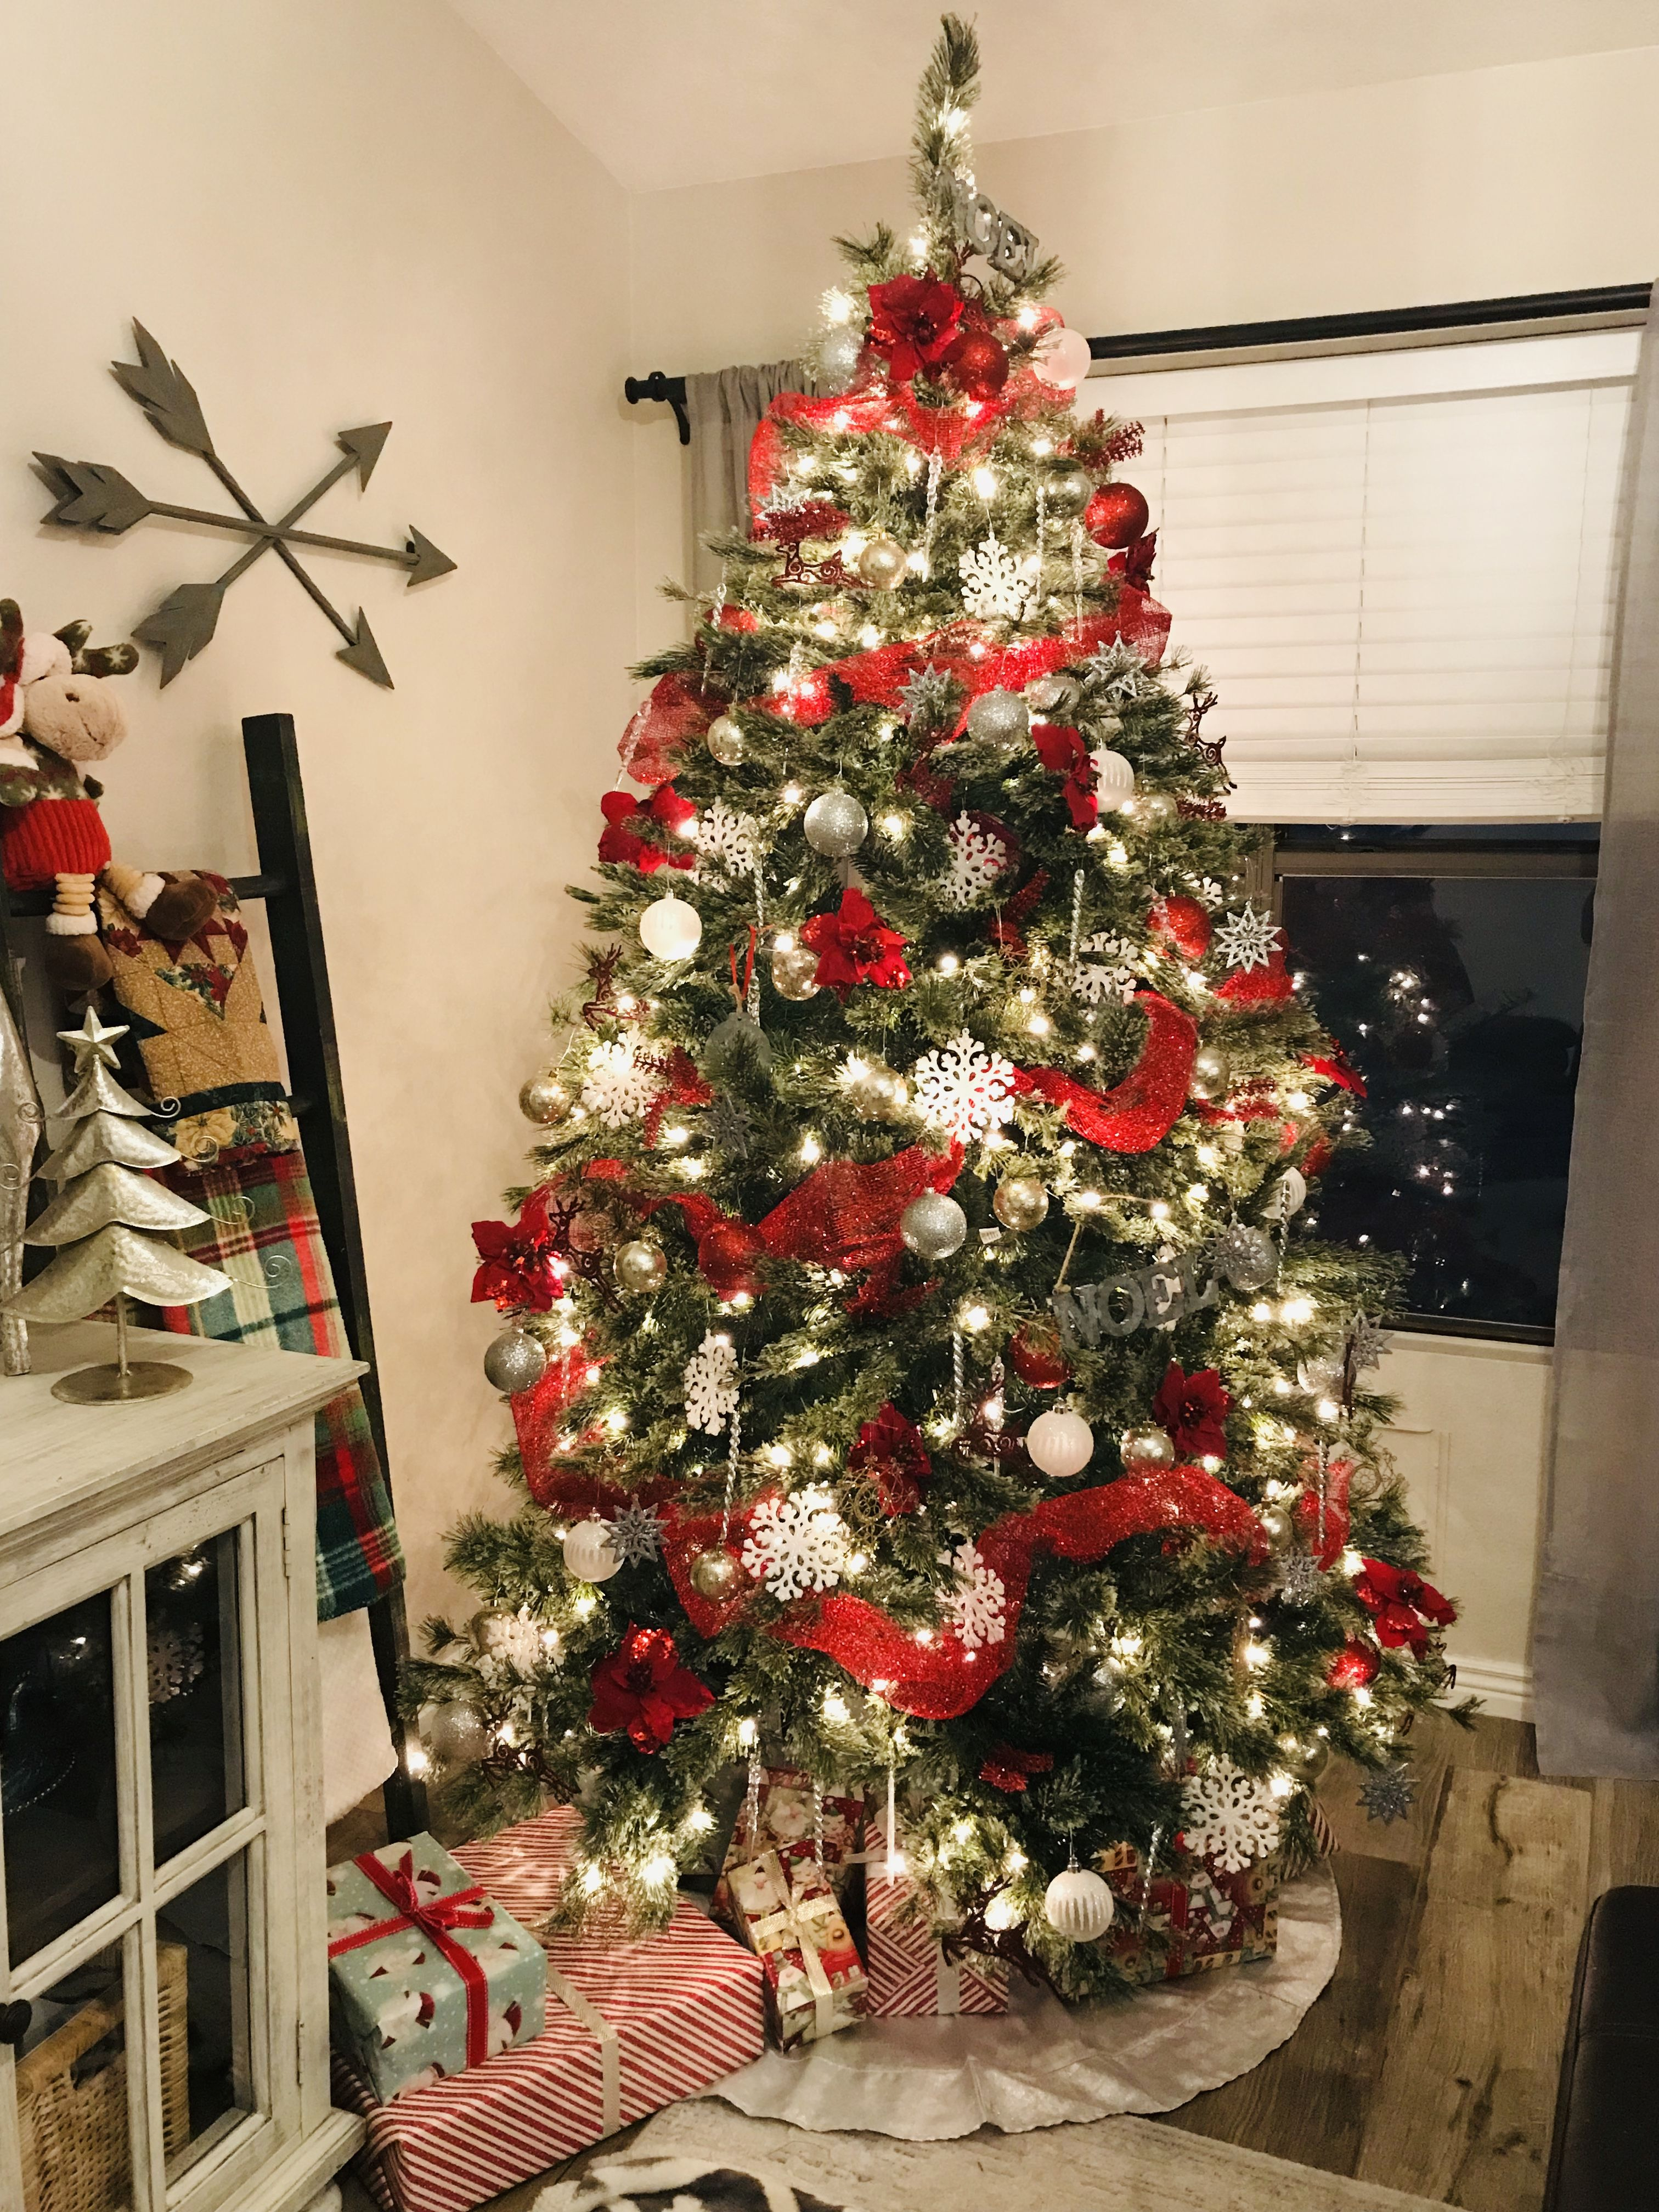 2018 Christmas Tree Christmas Tree Red And Silver Silver Christmas Tree Decorations Gold Christmas Decorations